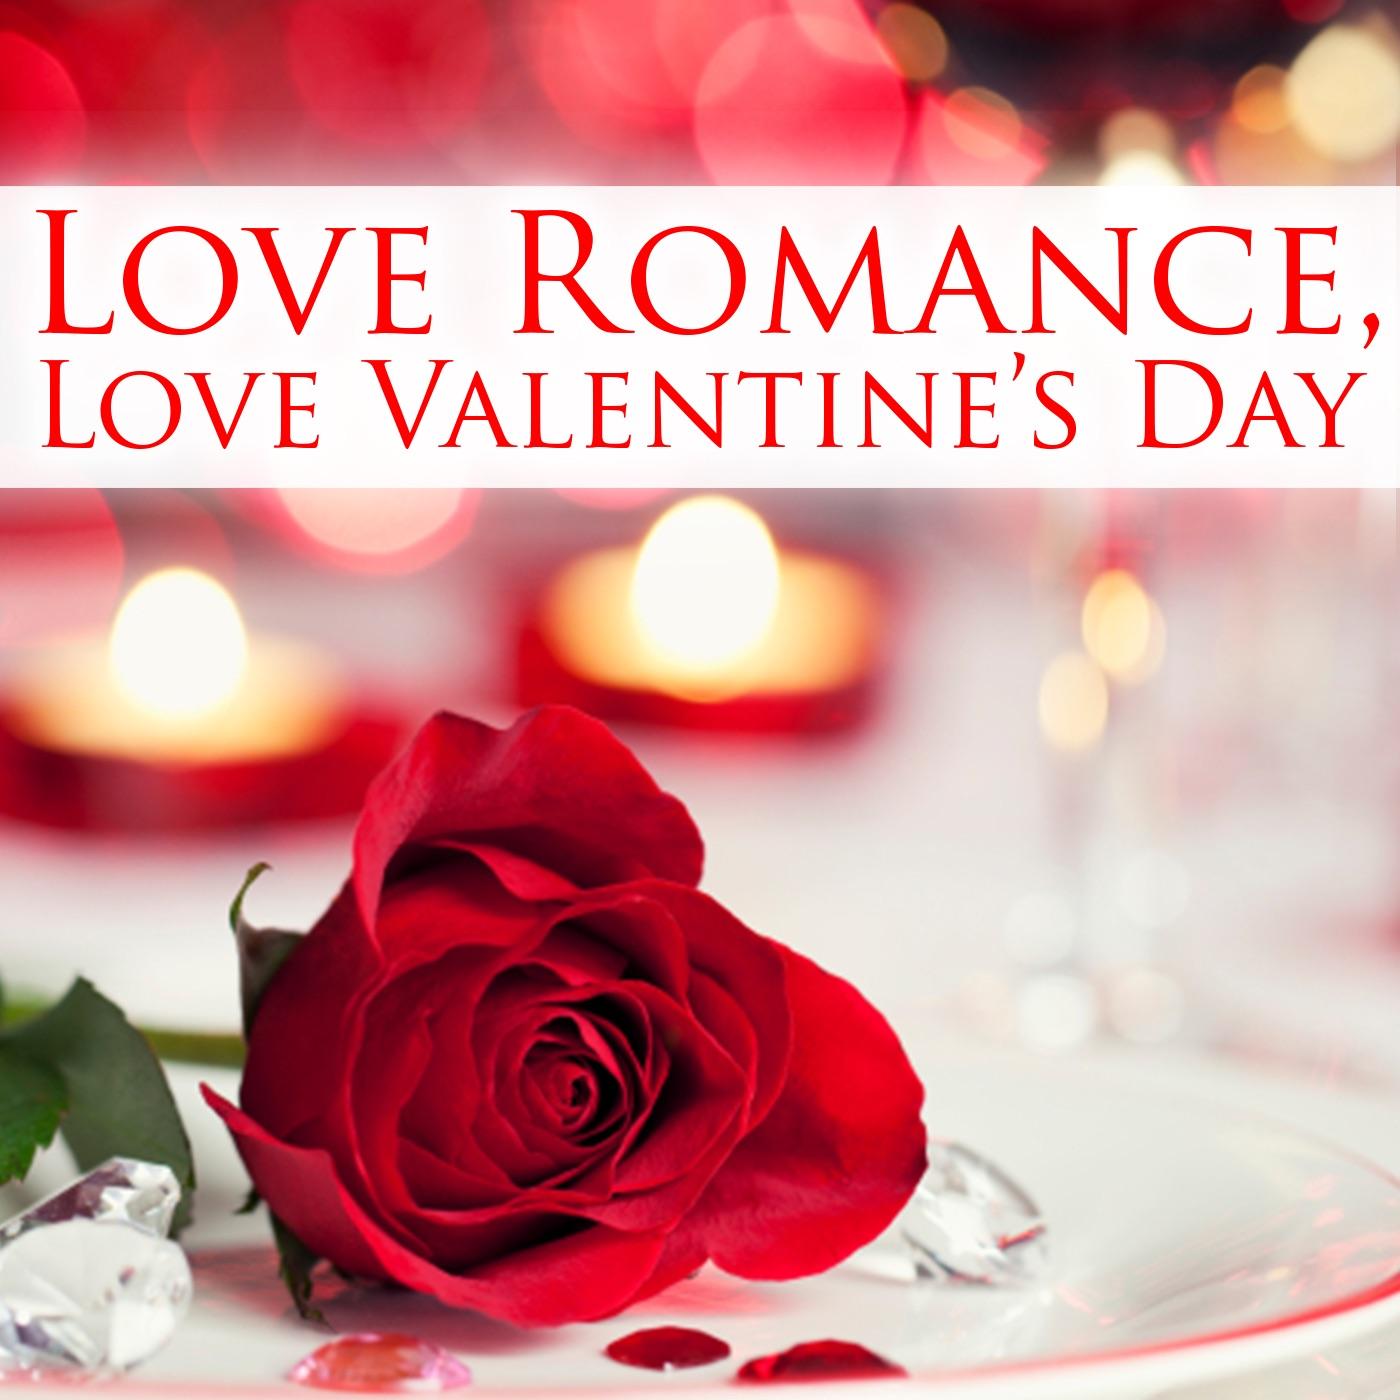 Love Romance, Love Valentine's Day